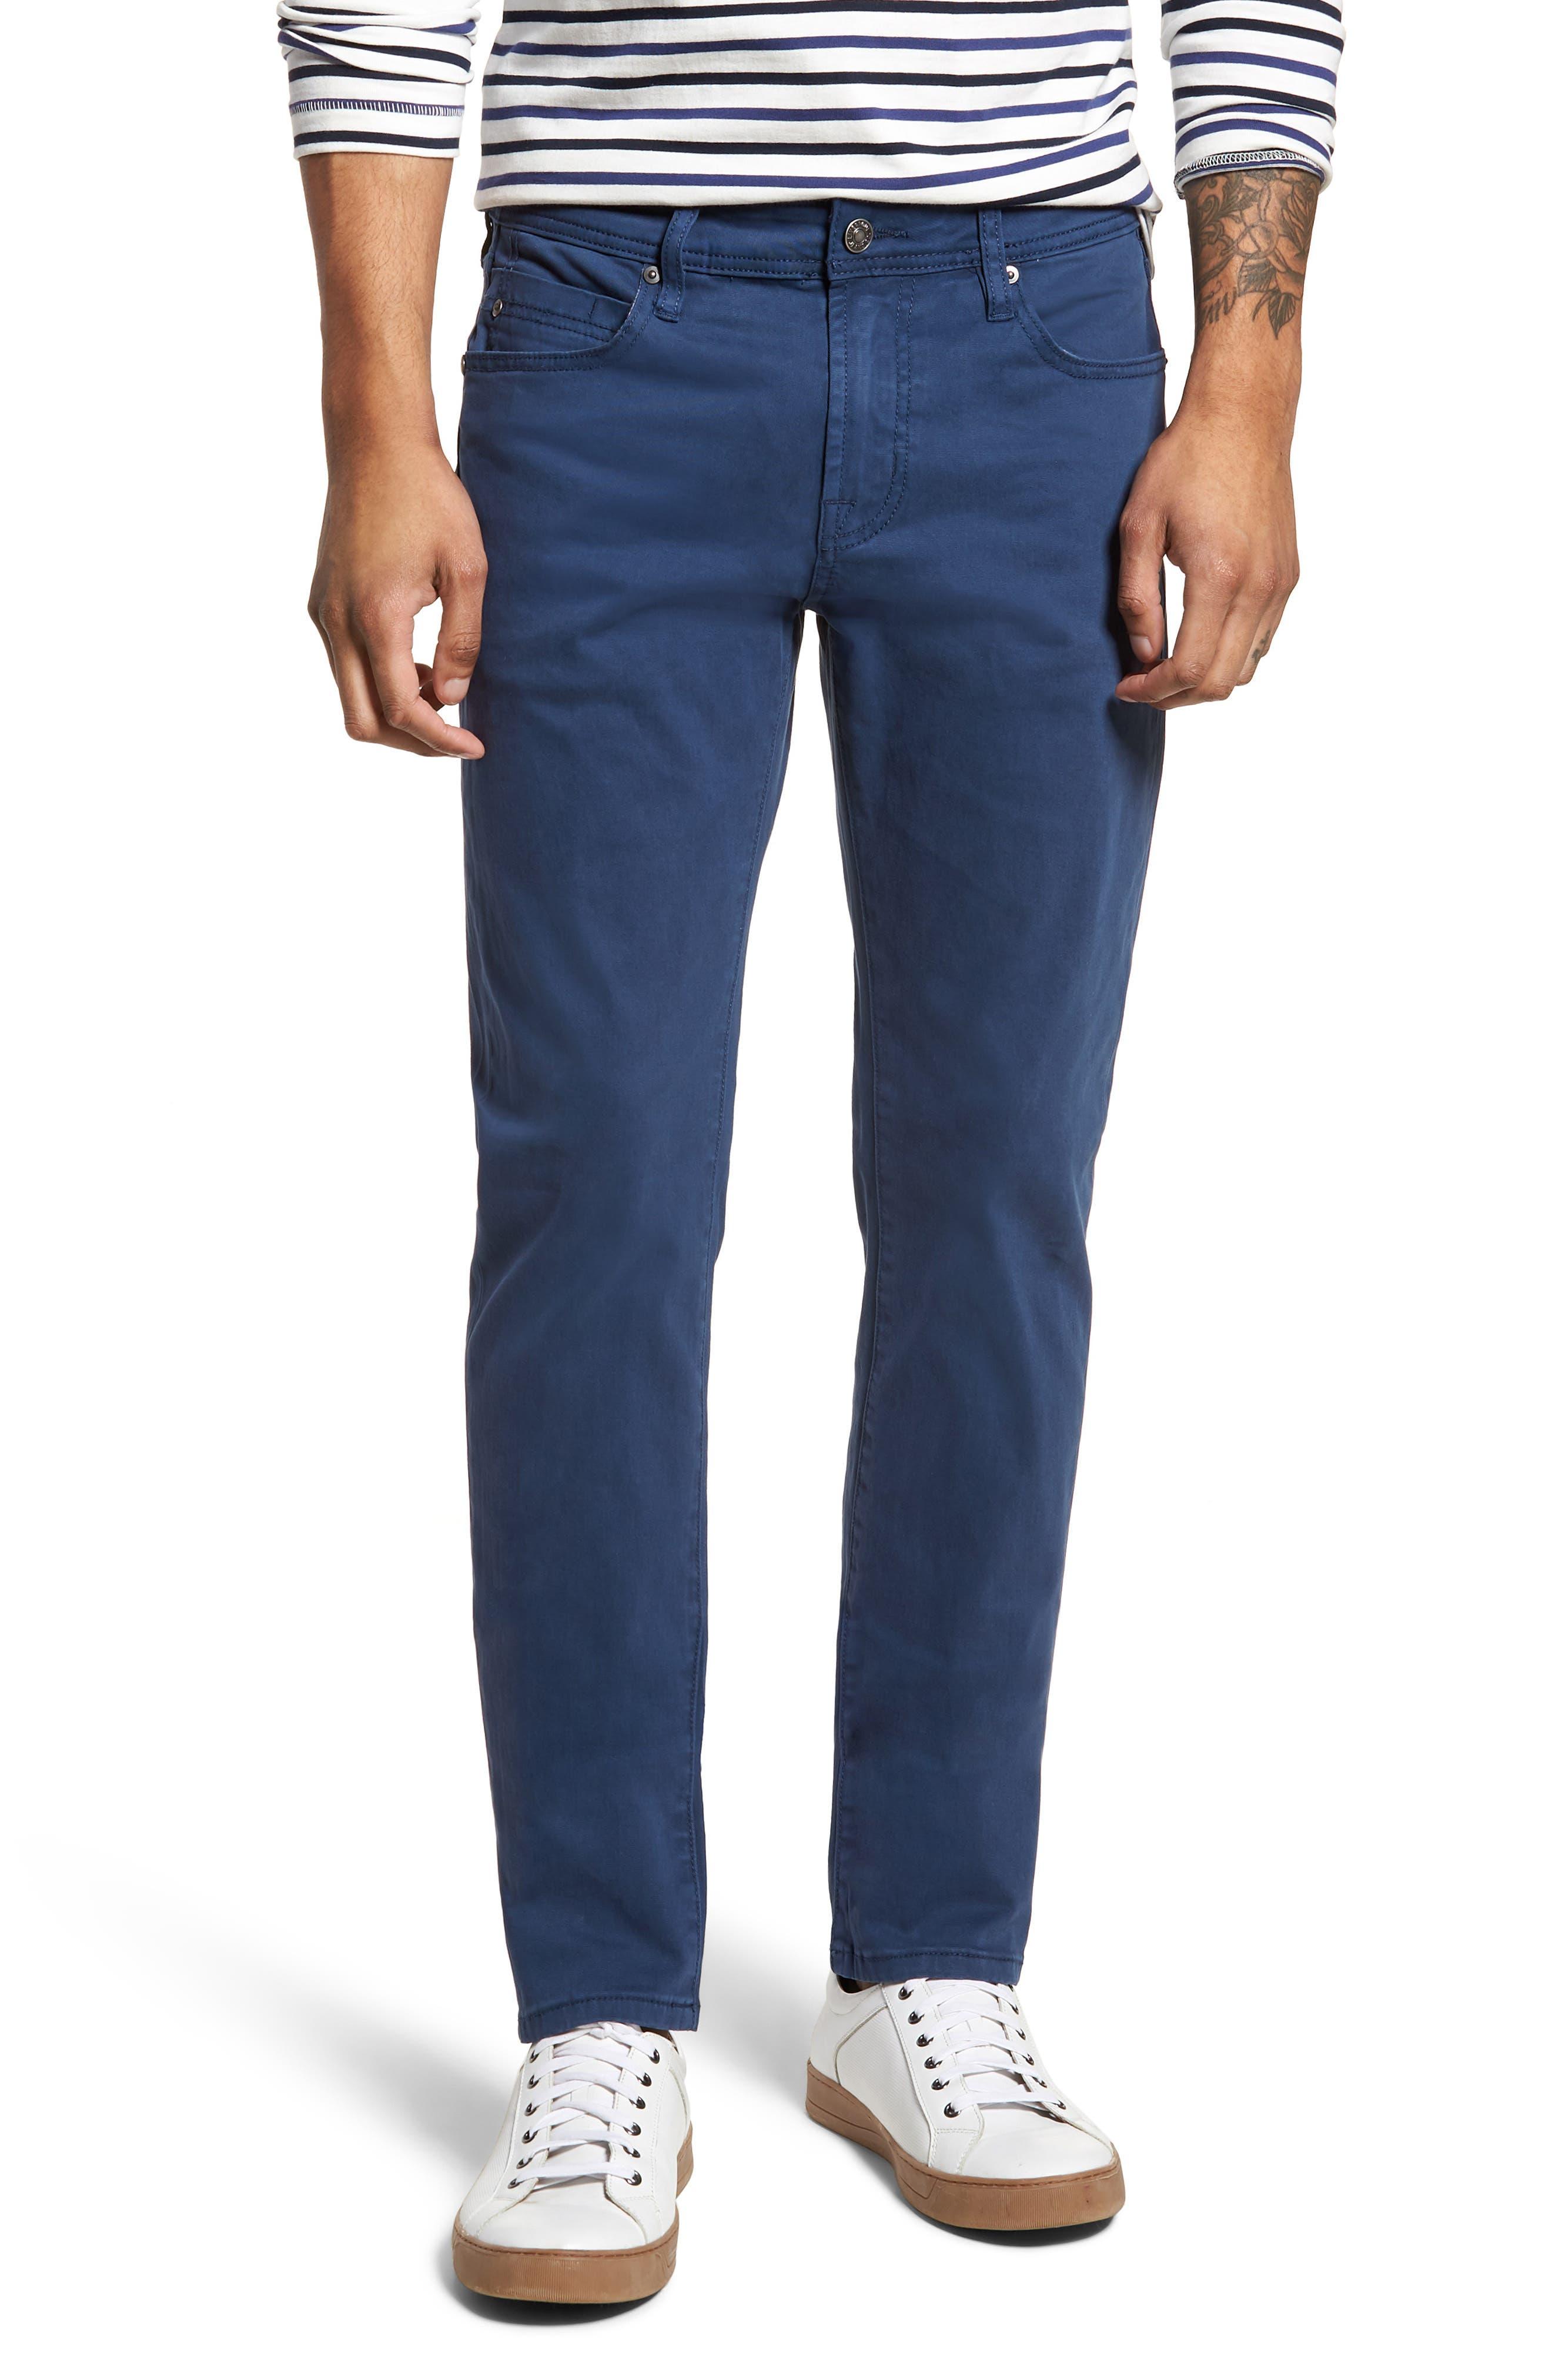 Alternate Image 1 Selected - Liverpool Jeans Co. Kingston Slim Straight Leg Jeans (Blue Twilight)